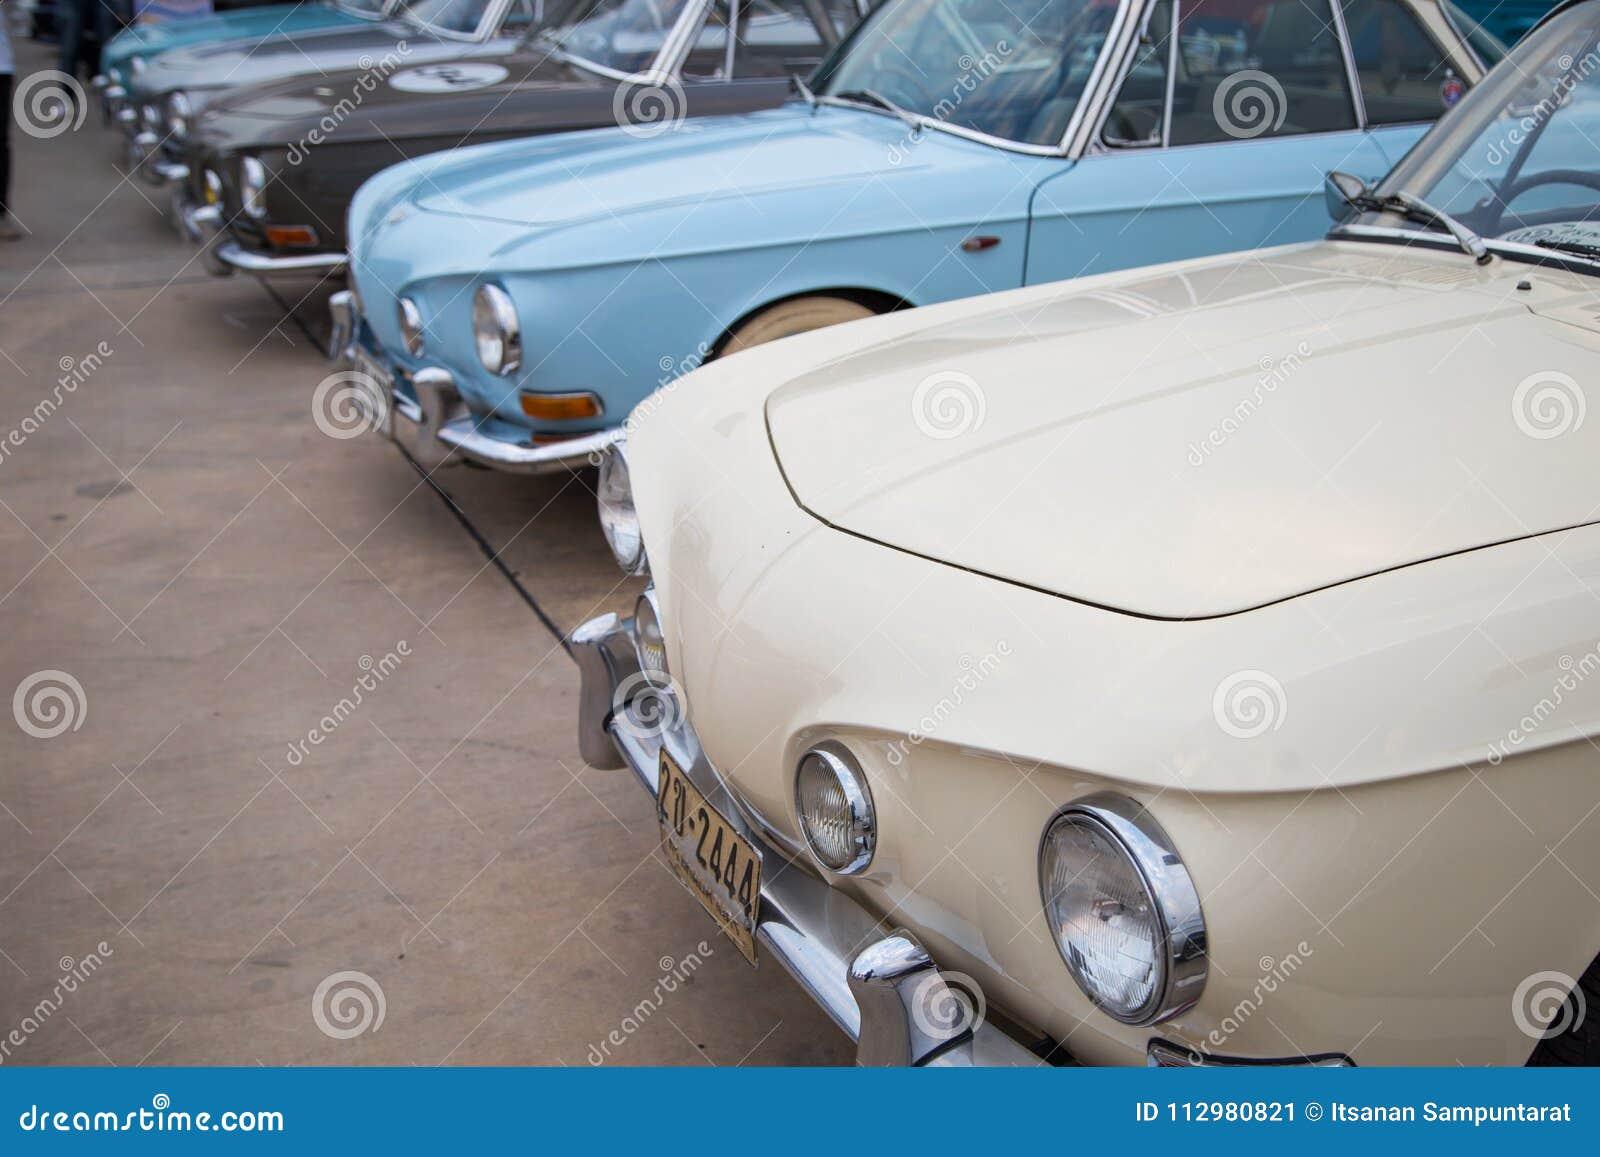 VW Karmann Ghia Type 34 show in VW club meeting